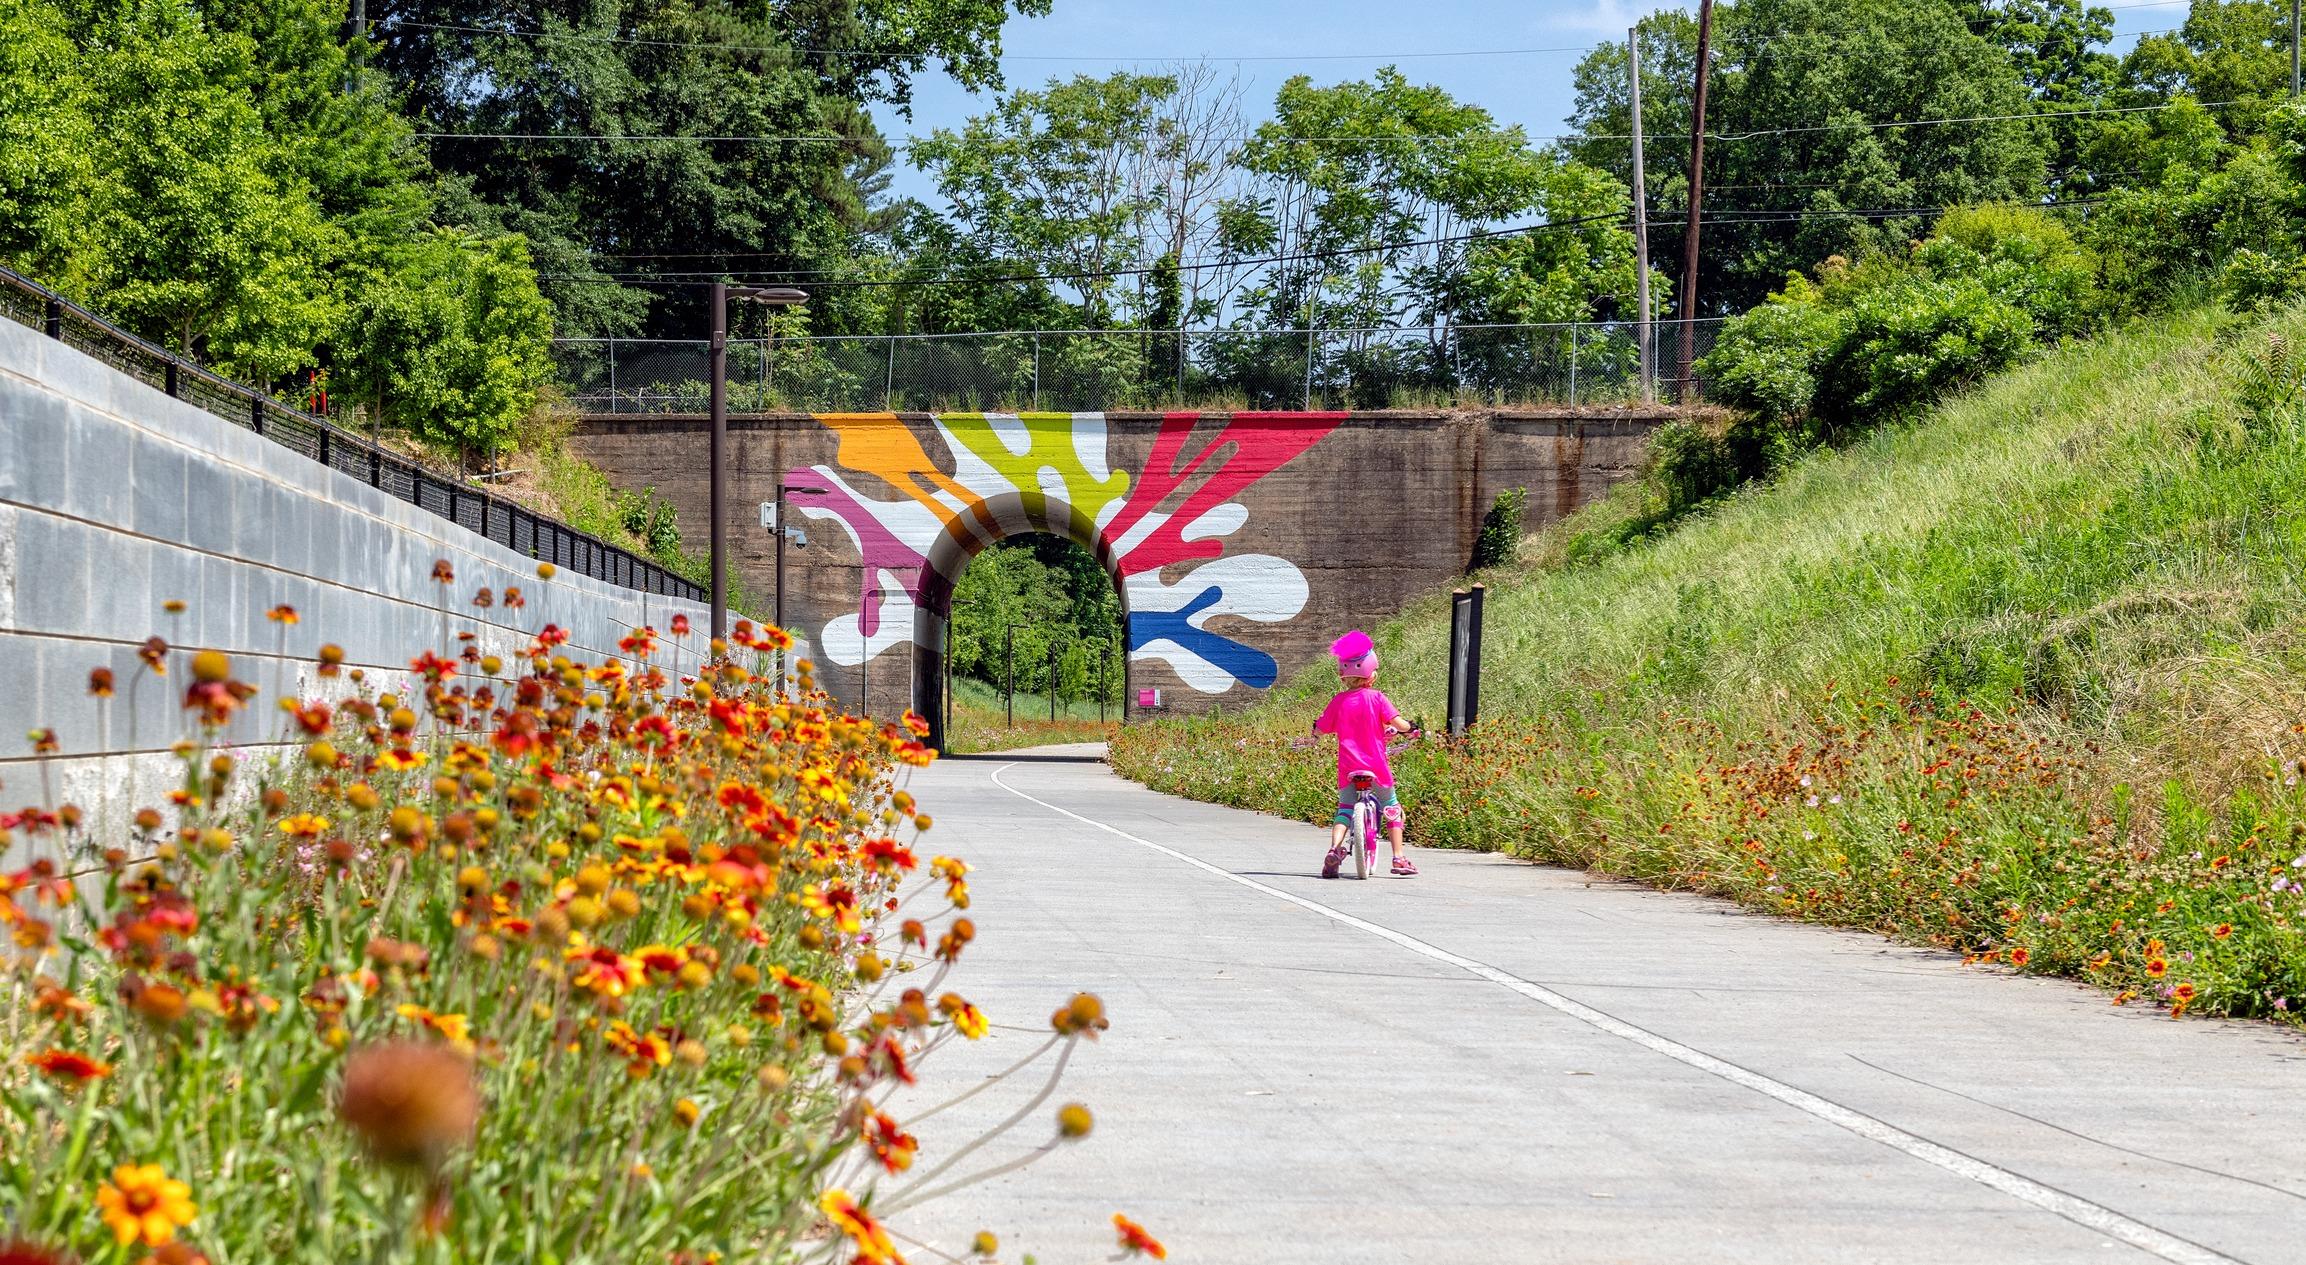 A little girl rides a bike toward a tunnel on The Atlanta Beltline.